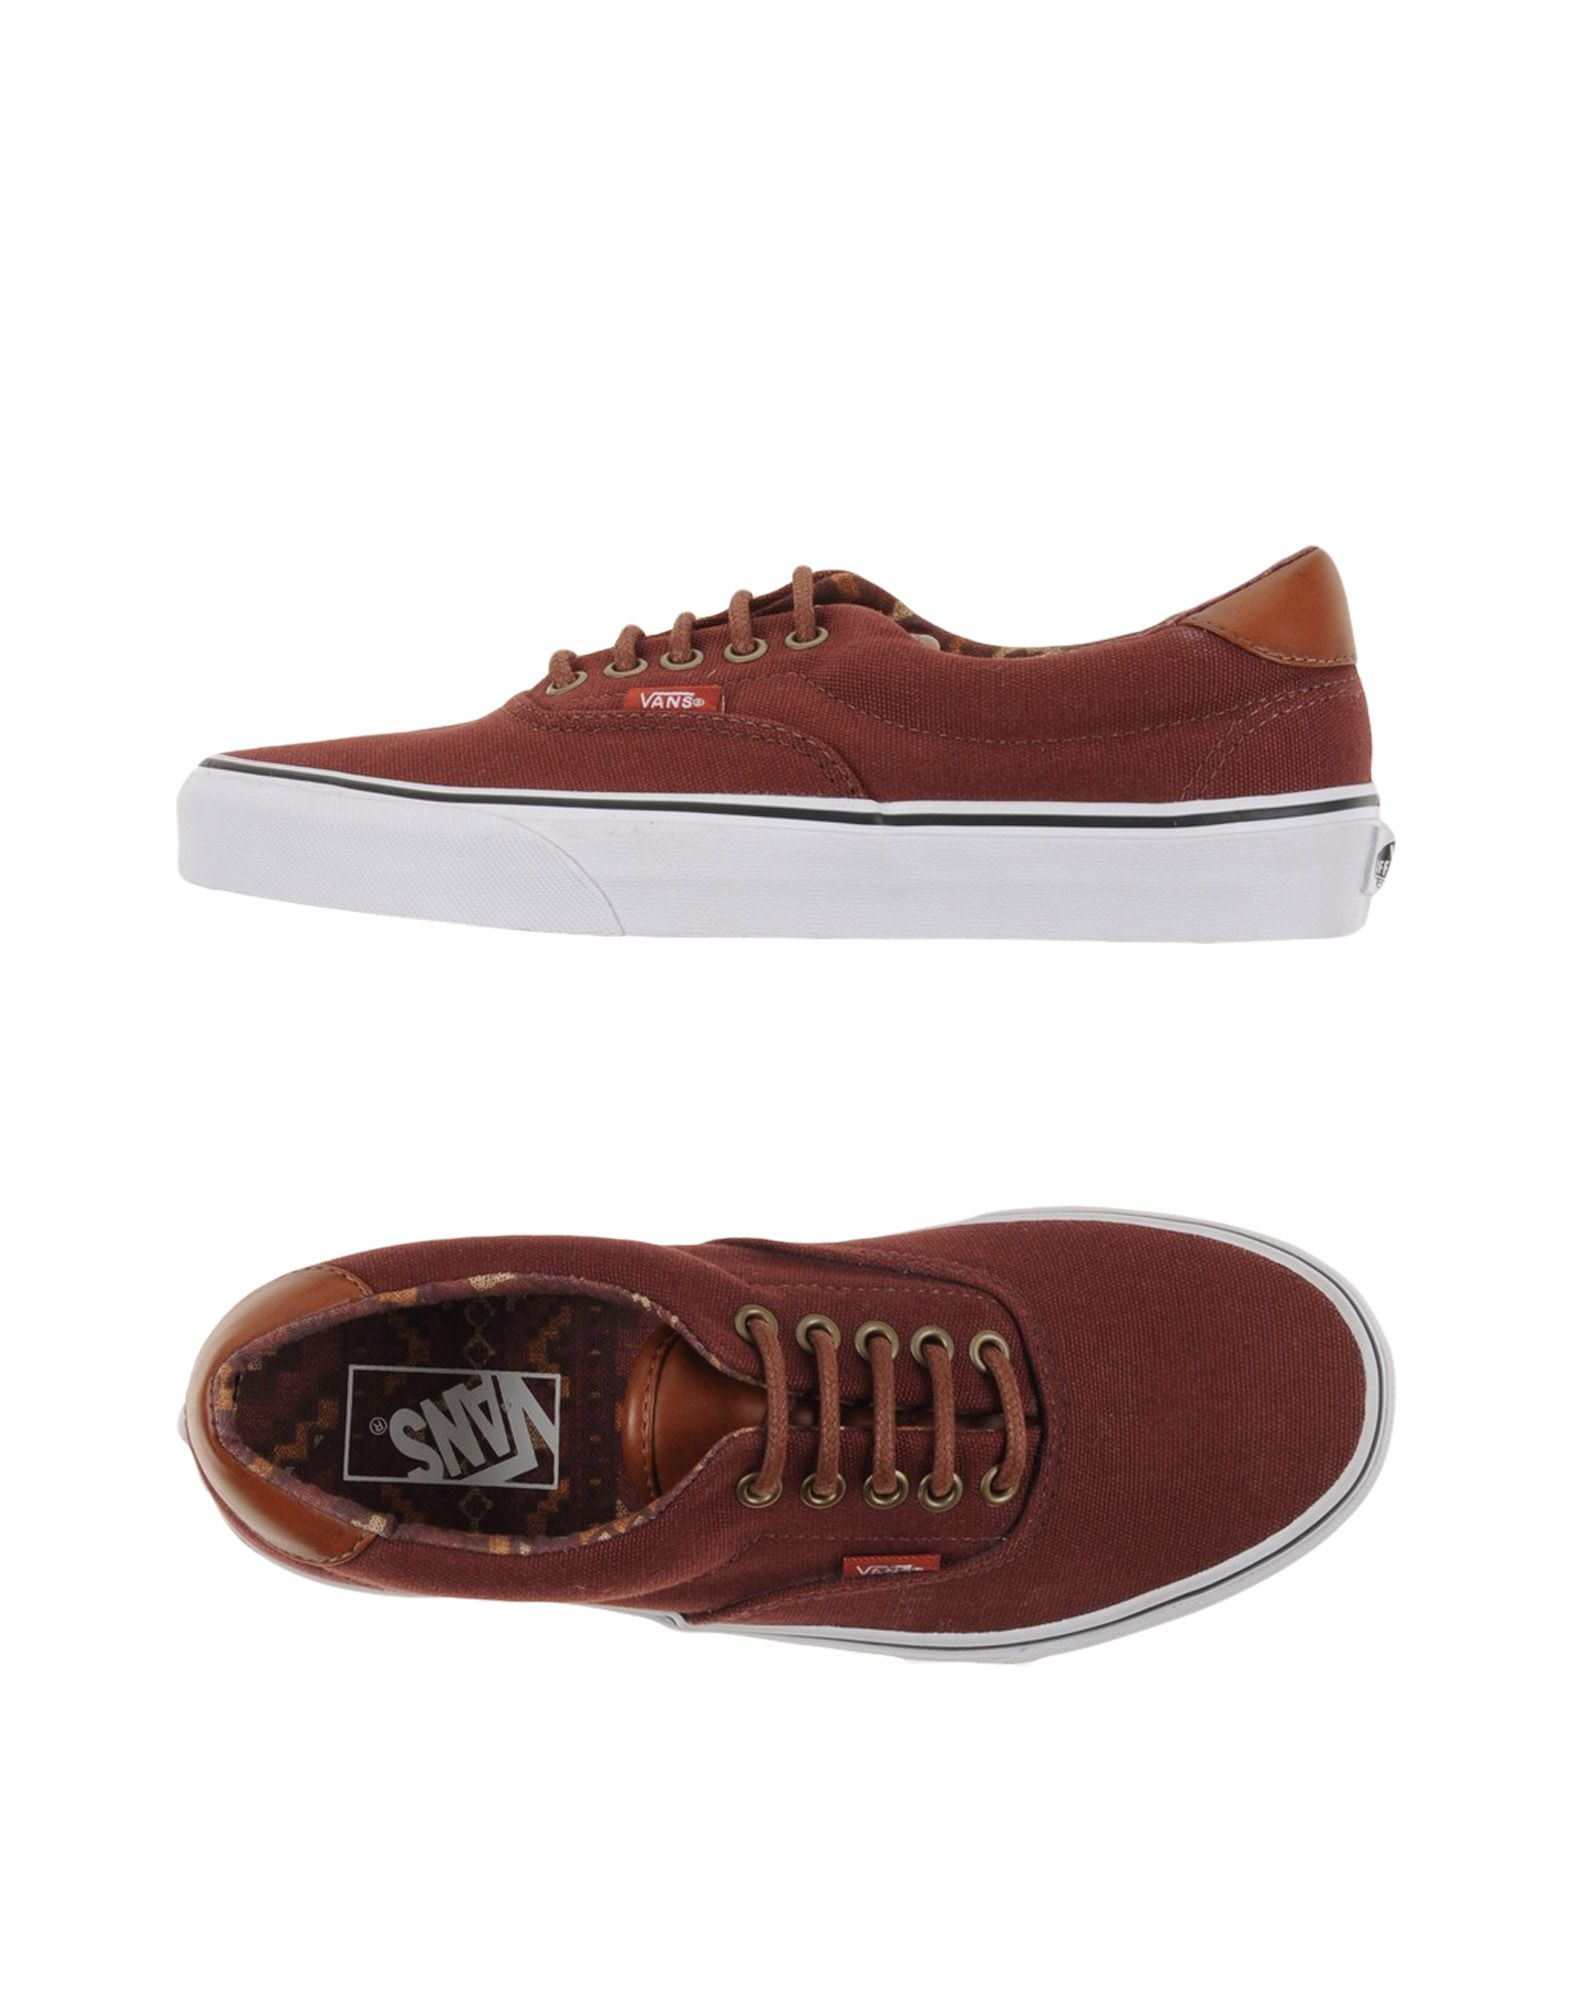 vans low tops sneakers in brown for men lyst. Black Bedroom Furniture Sets. Home Design Ideas